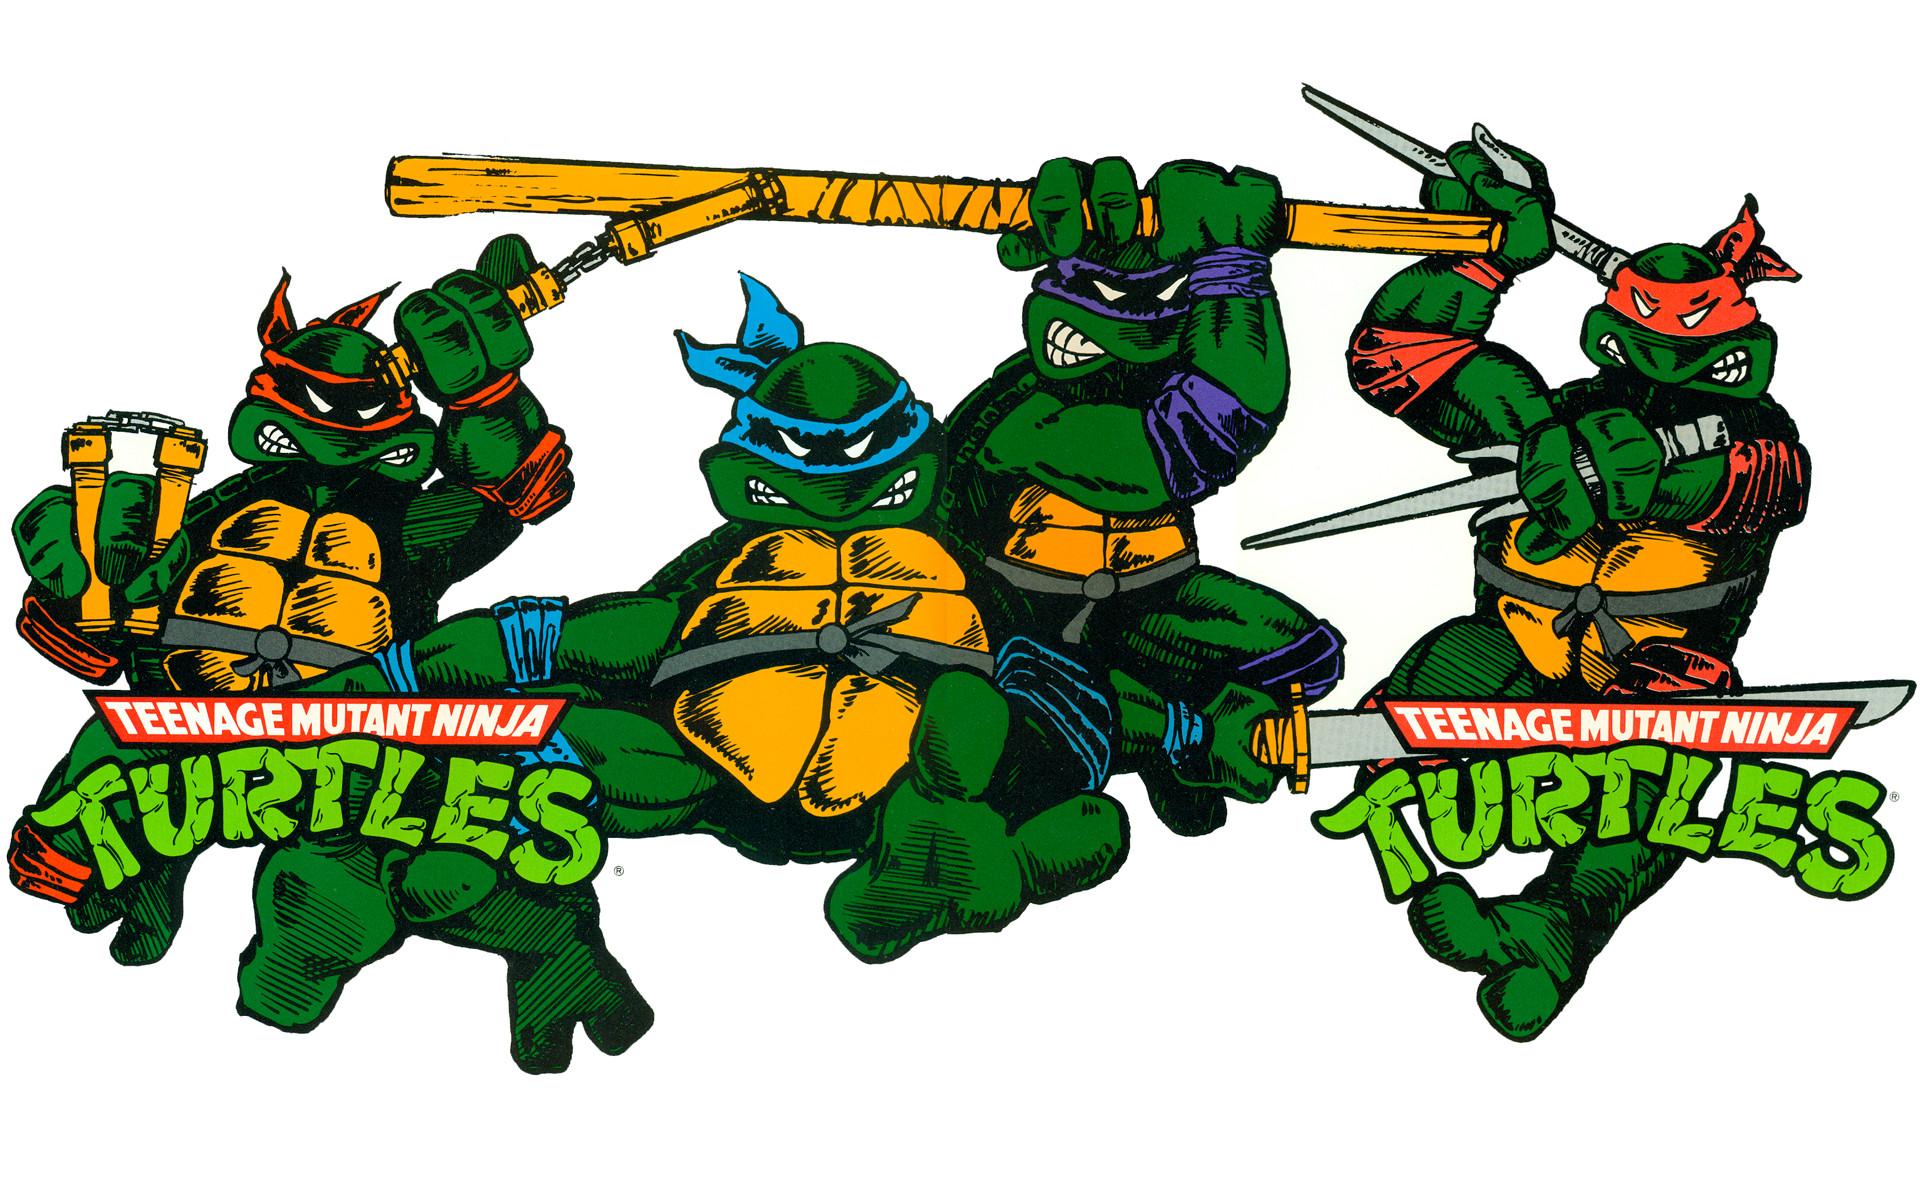 Teenage Mutant Ninja Turtles Wallpaper 1920x Download · Other Link